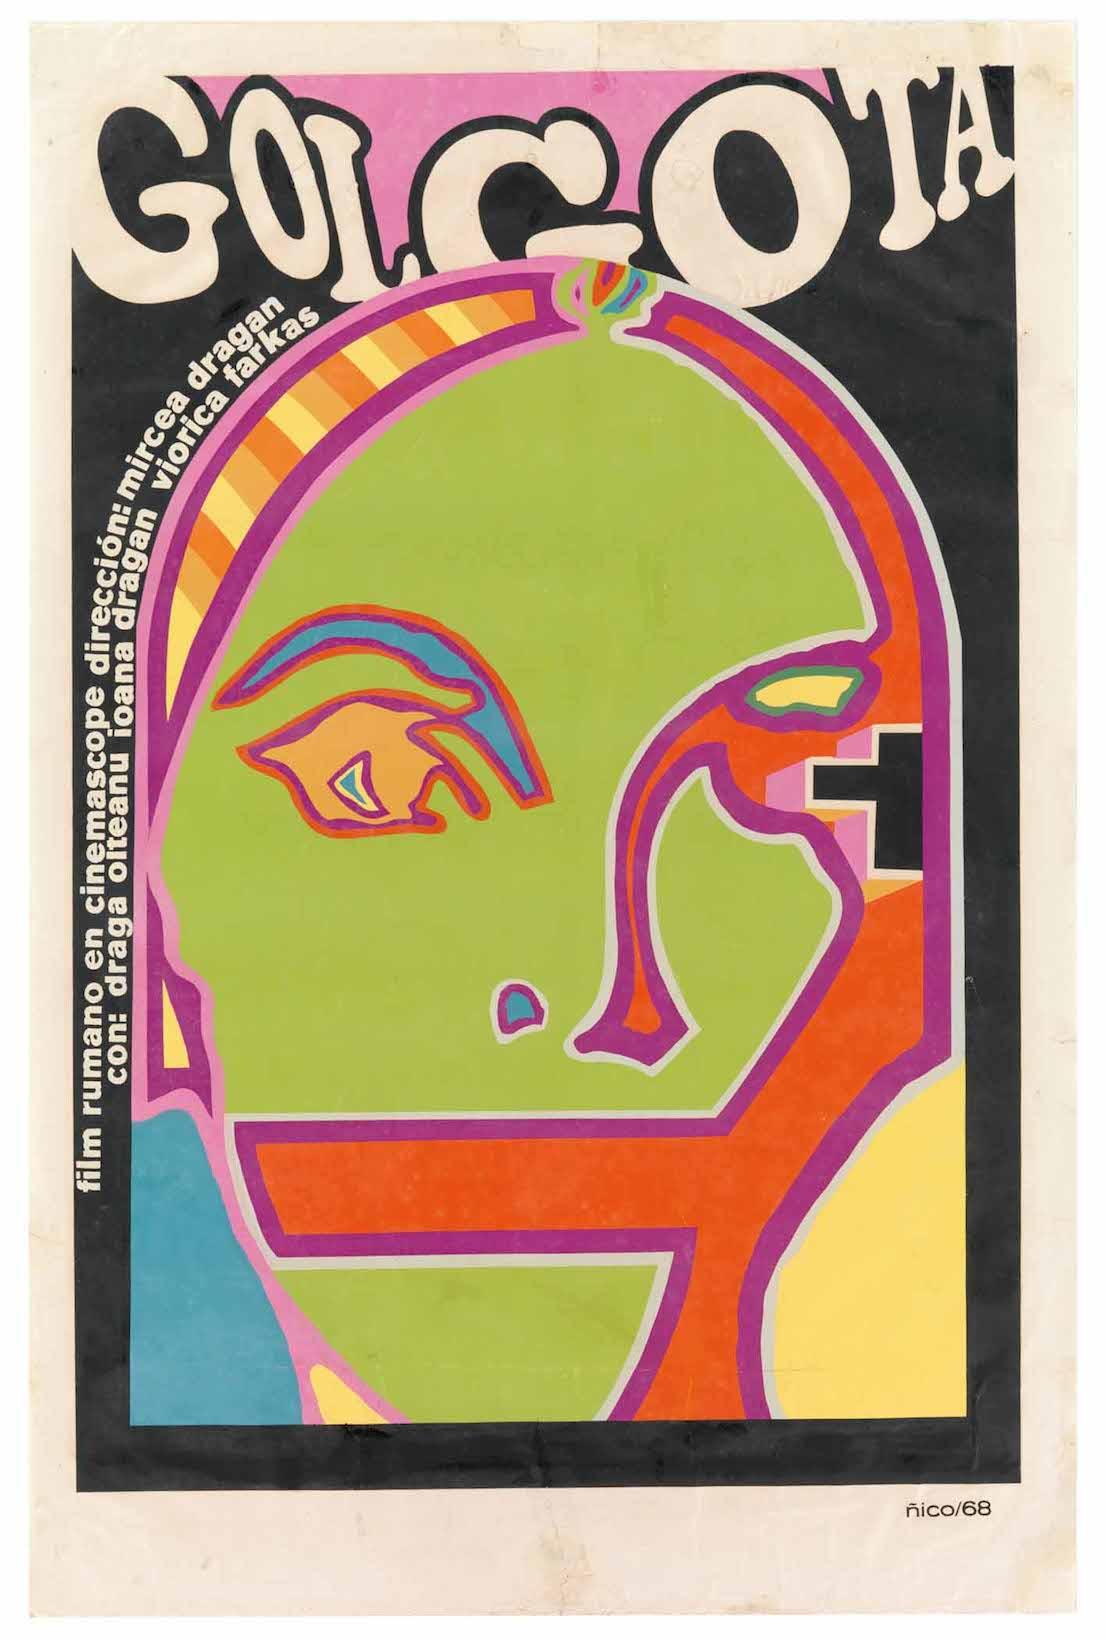 Antonio Perez Gonzalez (nico), Gogota, 1968.